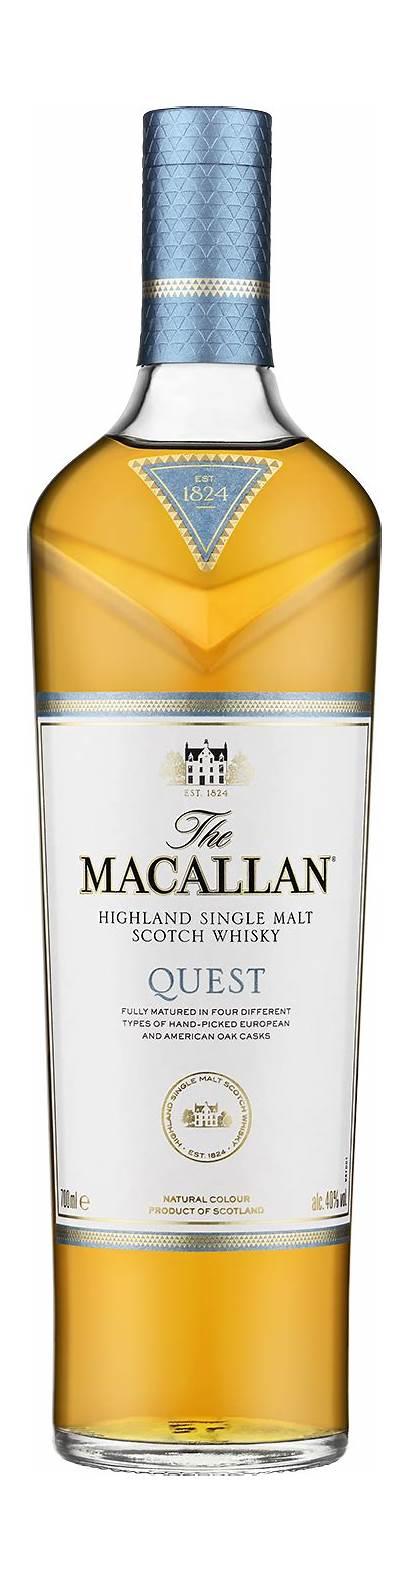 Macallan Quest Whisky Dk Dkk Malt Single